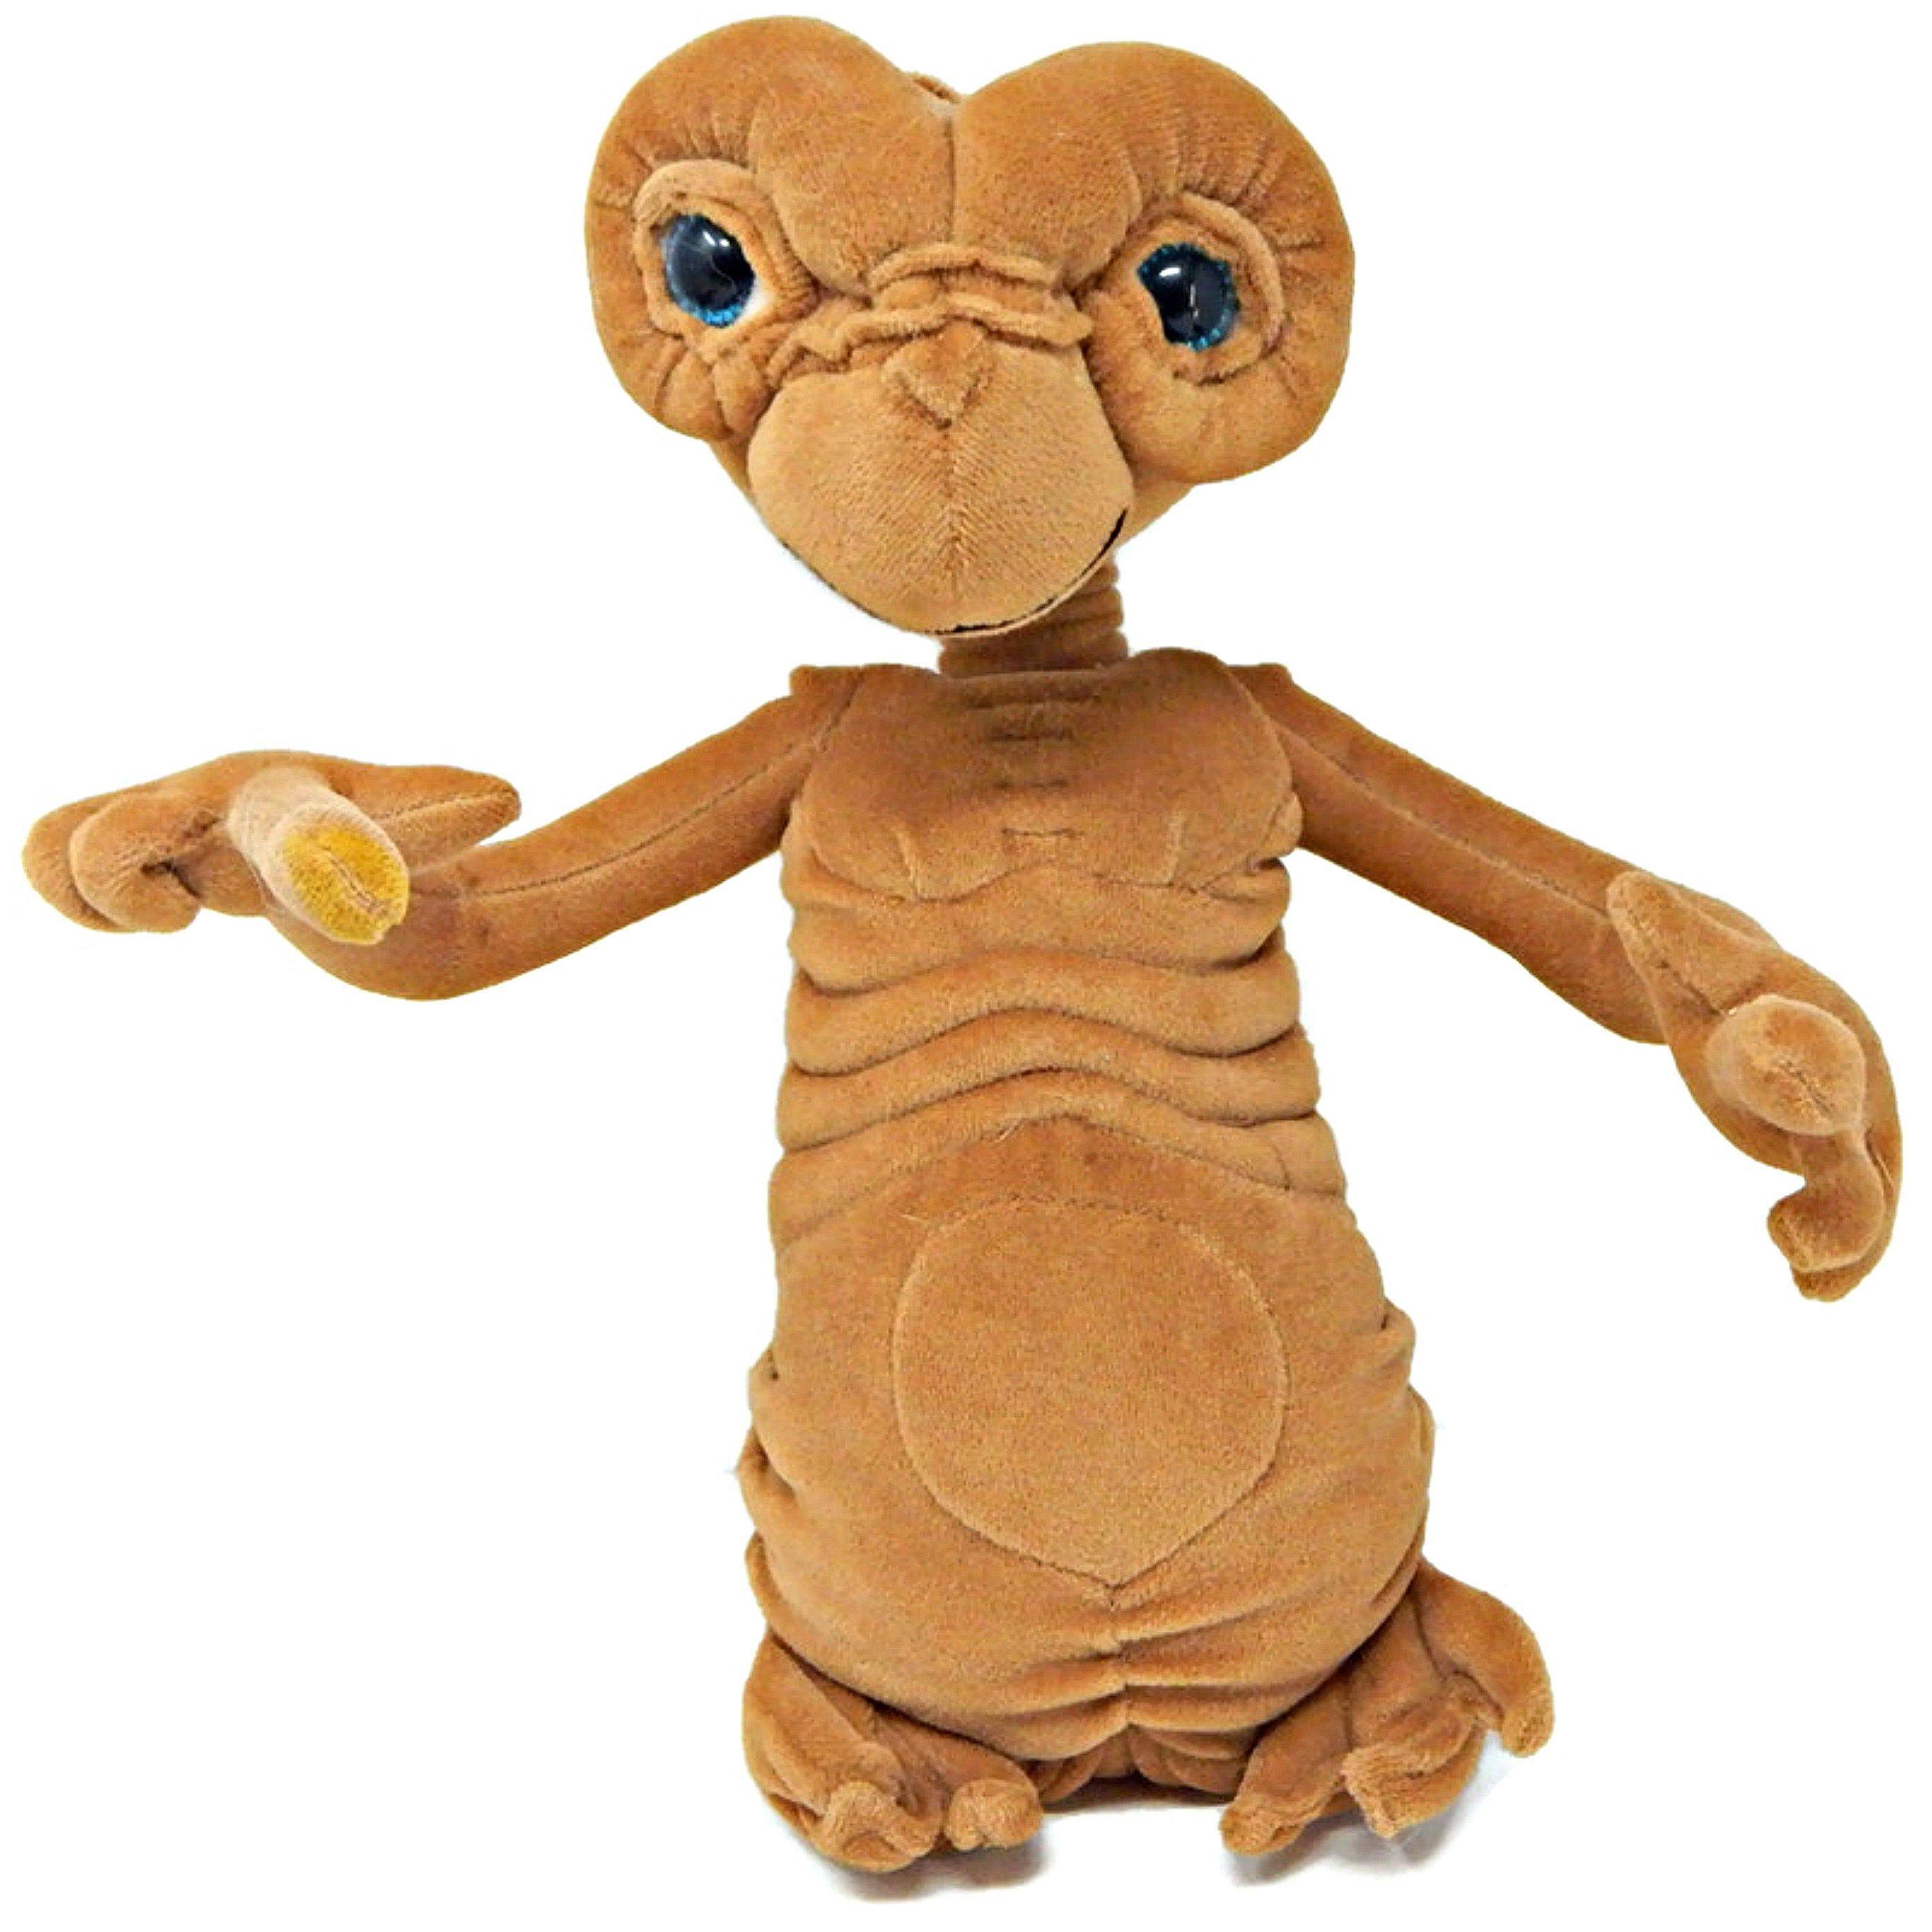 Vintage E T Extra Terrestrial Plush Toy Doll Stuffed Animal Etsy Plush Toy Plush Toy Dolls Plush Dolls [ 2800 x 2800 Pixel ]